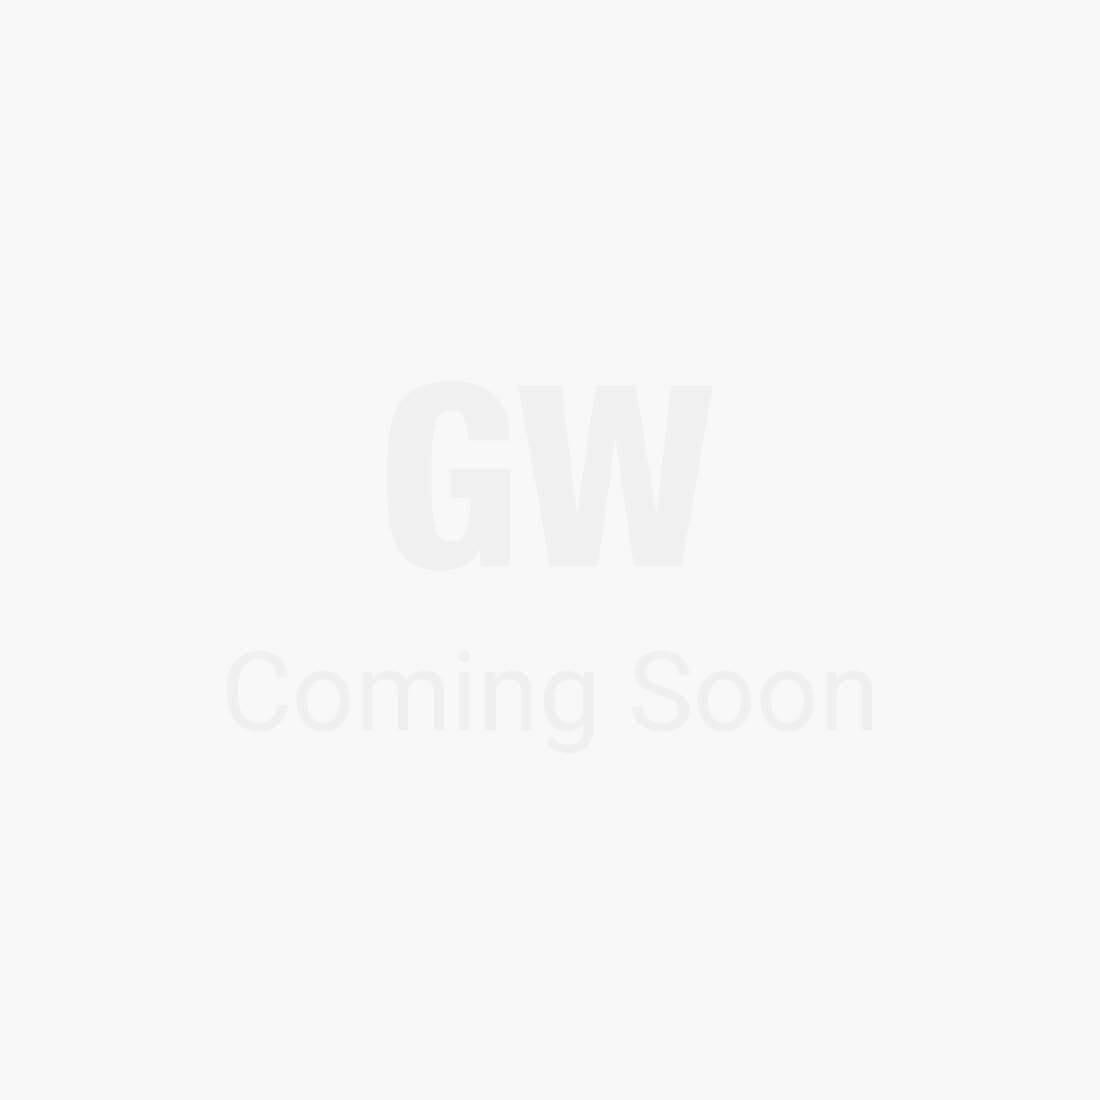 Hugo Panel Bedheads